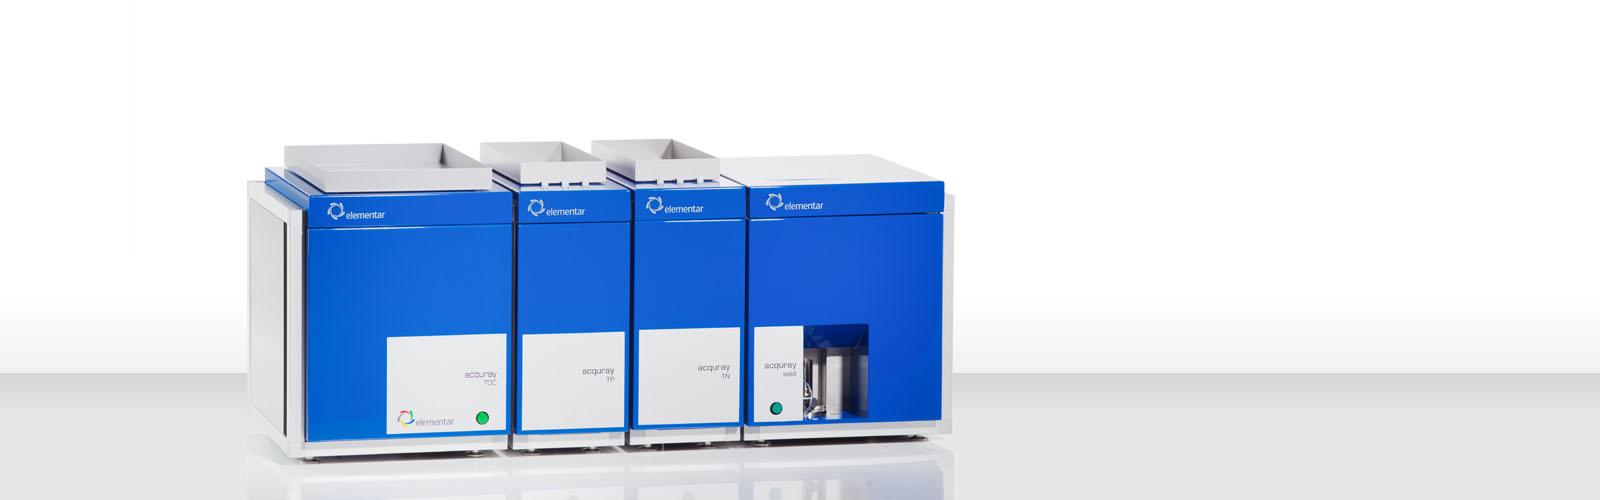 elementar水質分析儀 TOC分析儀 acquray 系列